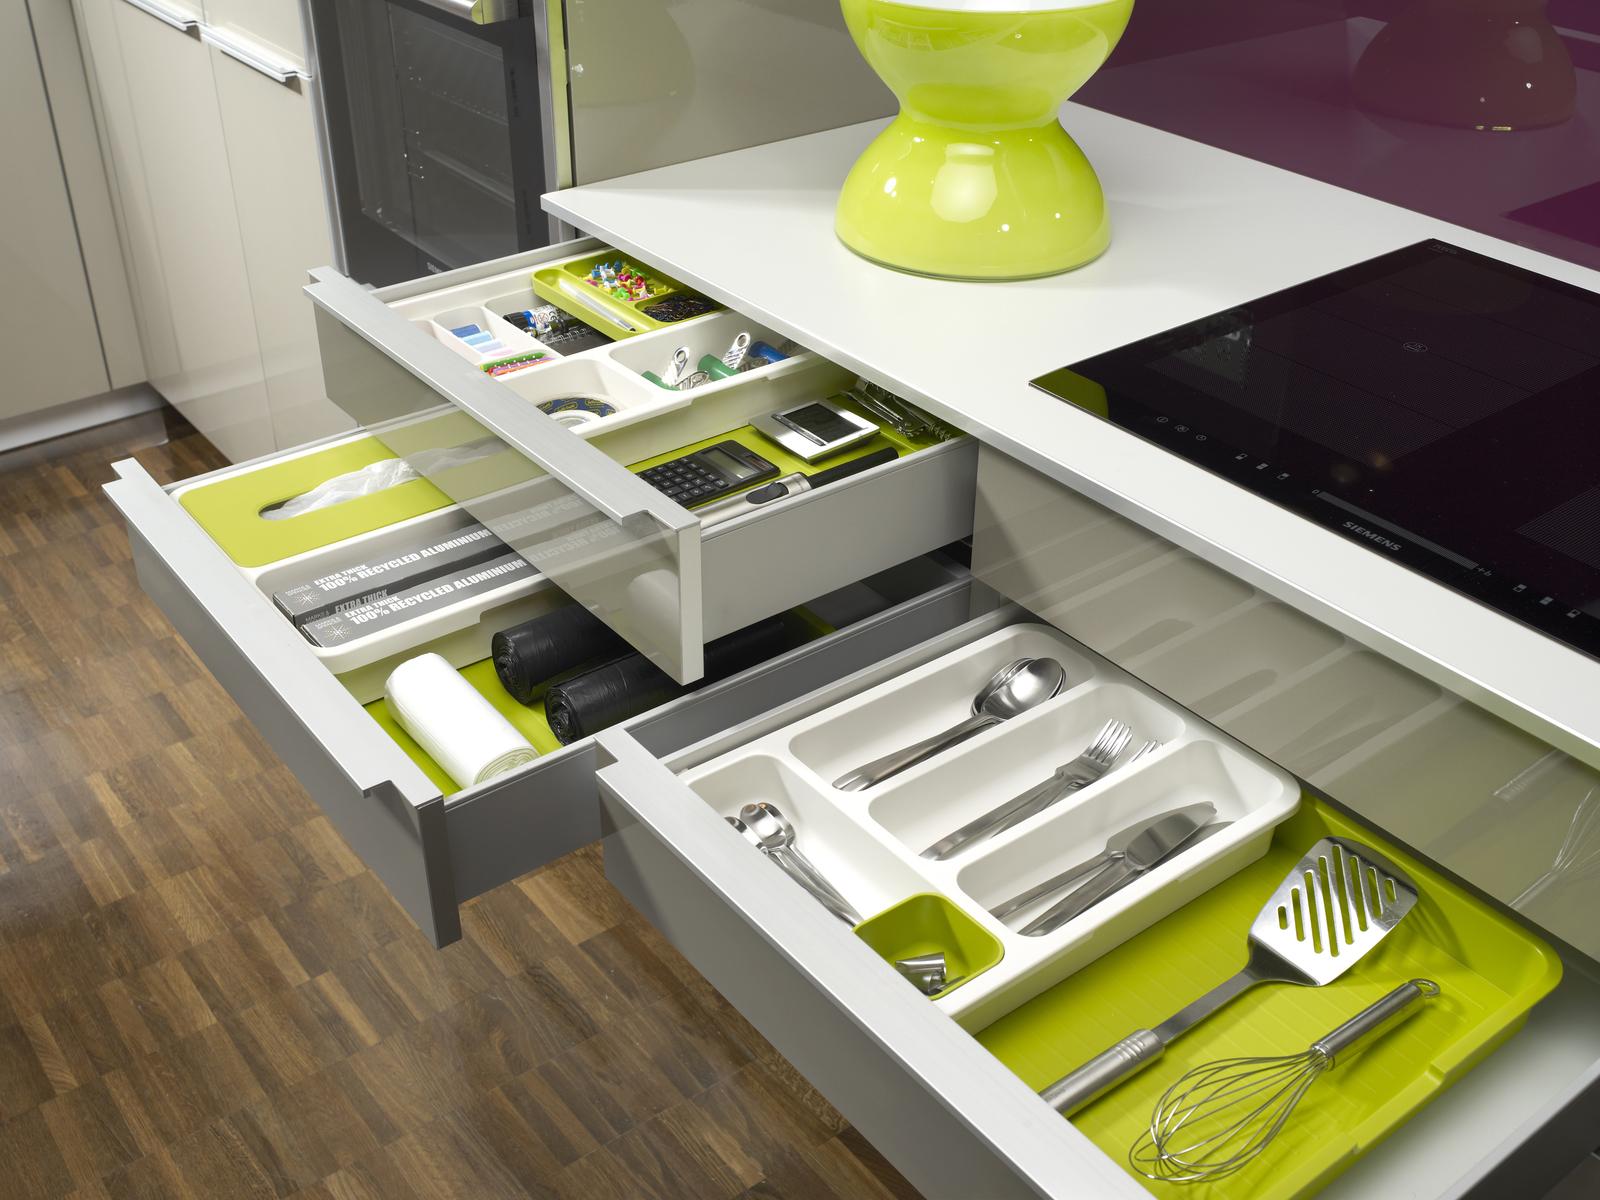 КРртинРи по зРпросу приборов DrawerStore Expandable Cutlery Tray